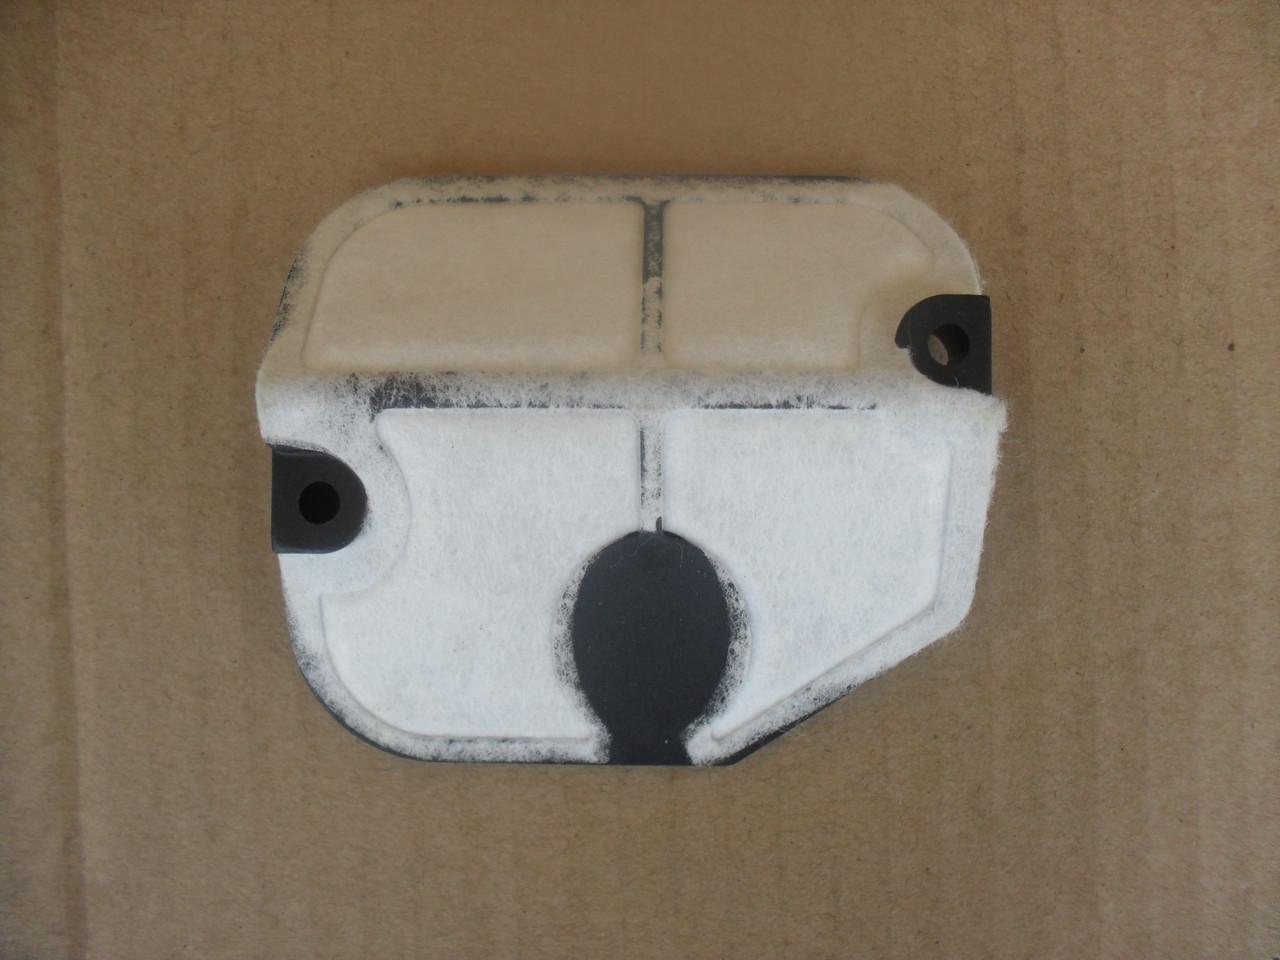 Air Filter for Craftsman 358.350240, 358.351191, 358.350202, 358.350203, 358.348231, 358.350200, 358.351210, 358.356240, 358.356241, 358.356242, 545057701